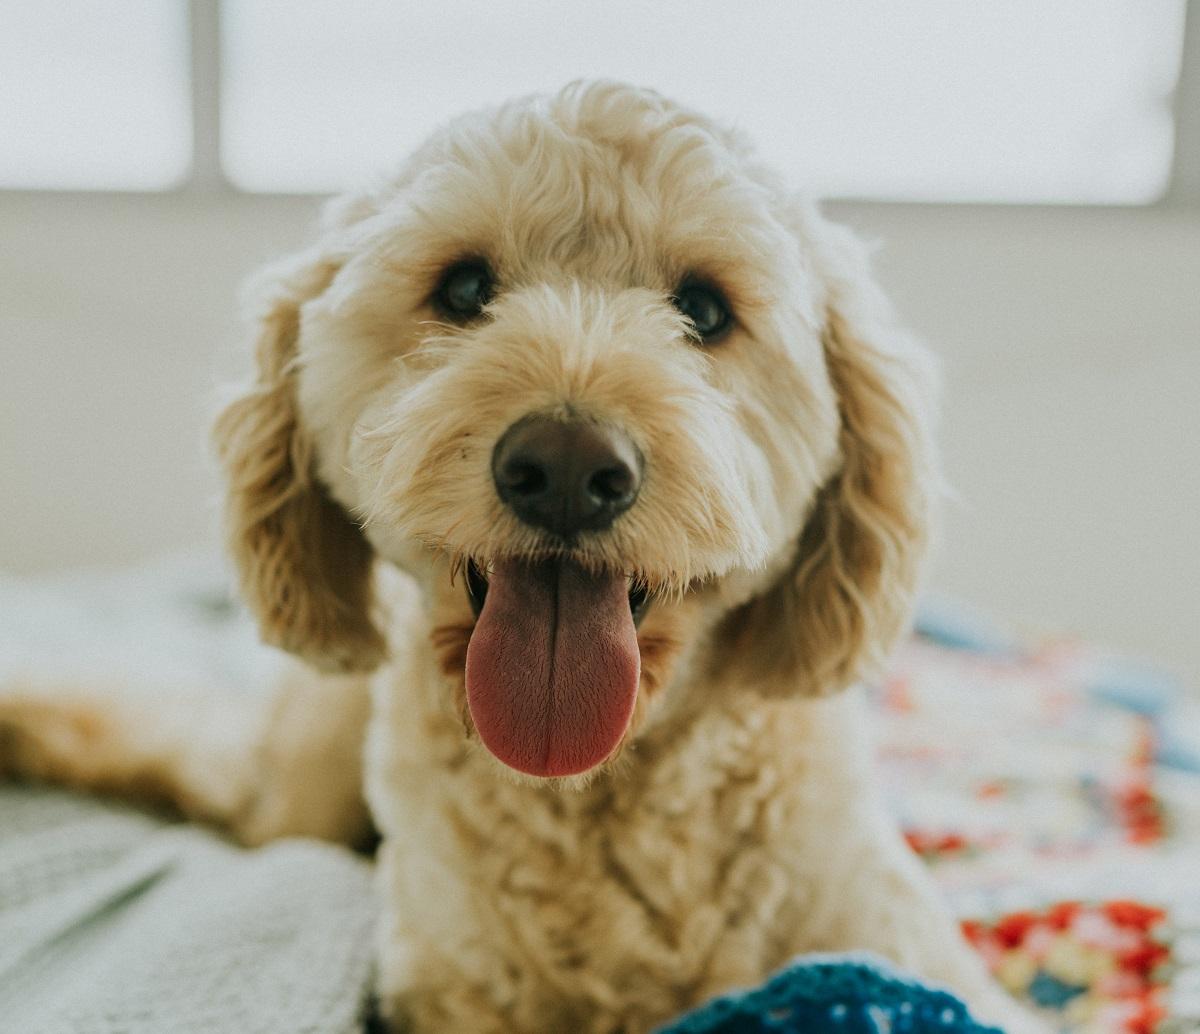 oud-en-nieuw-vuurwerk-jaarwisseling-huisdieren-hond-2